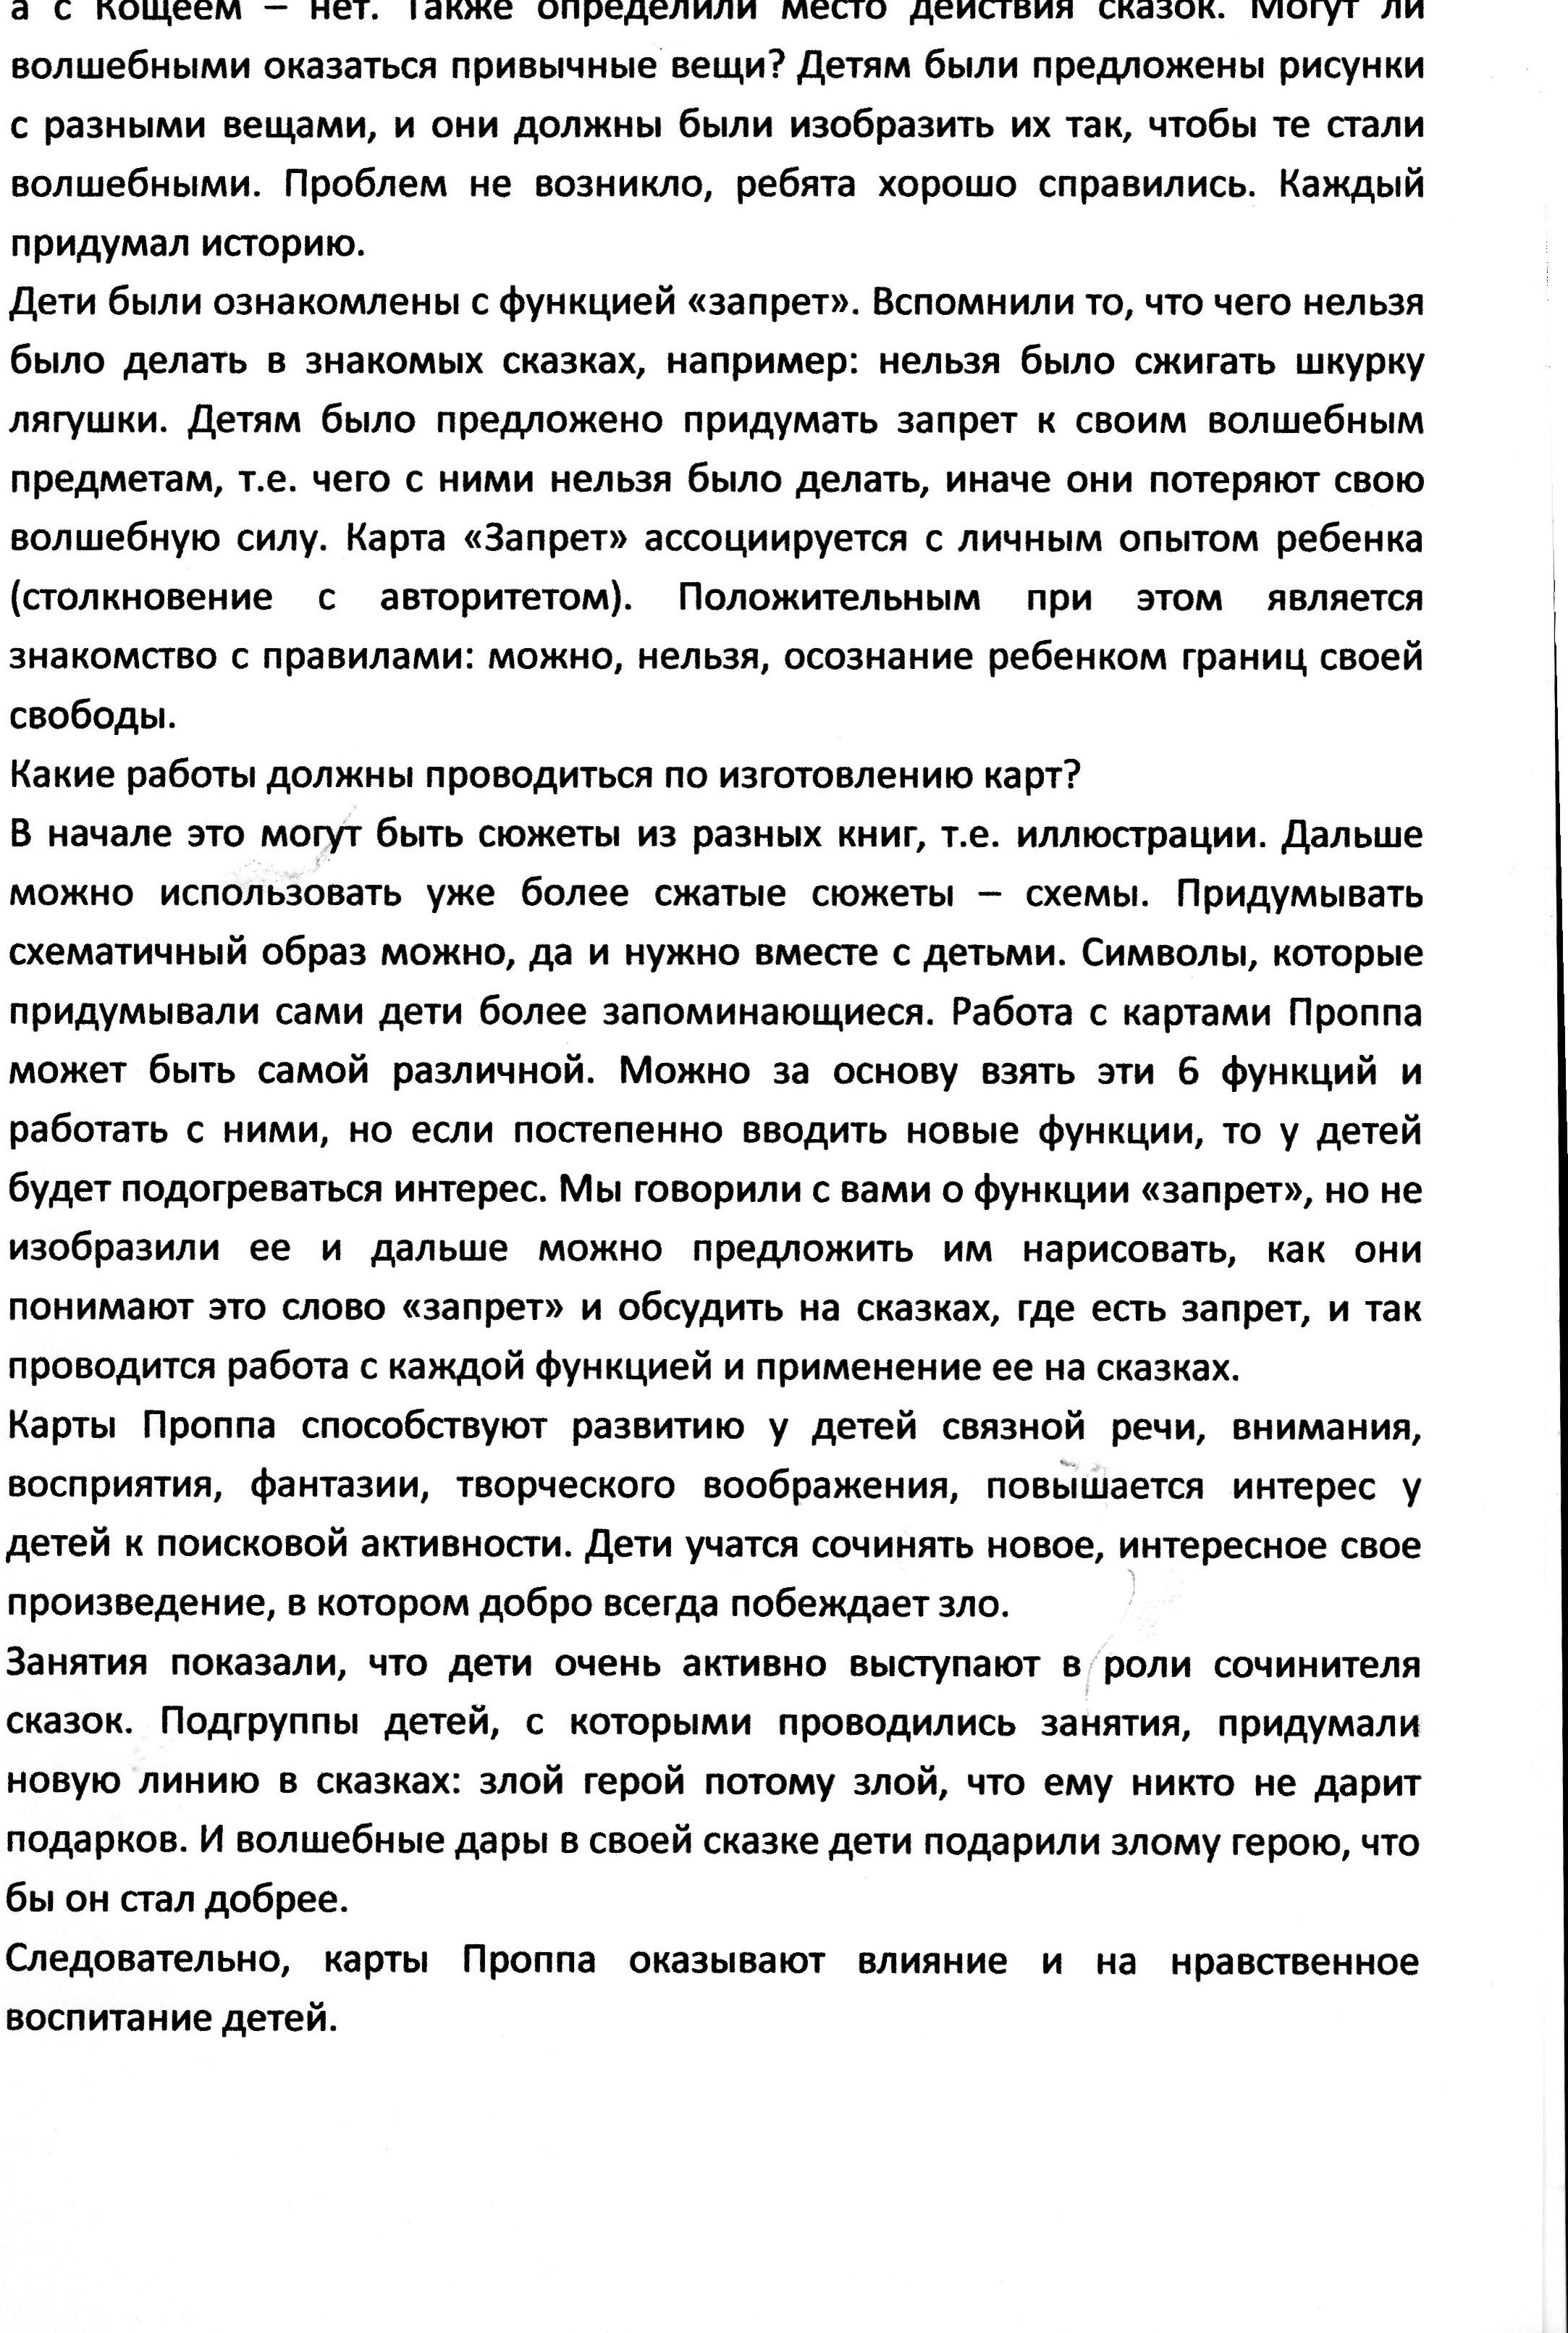 hello_html_15678b88.jpg